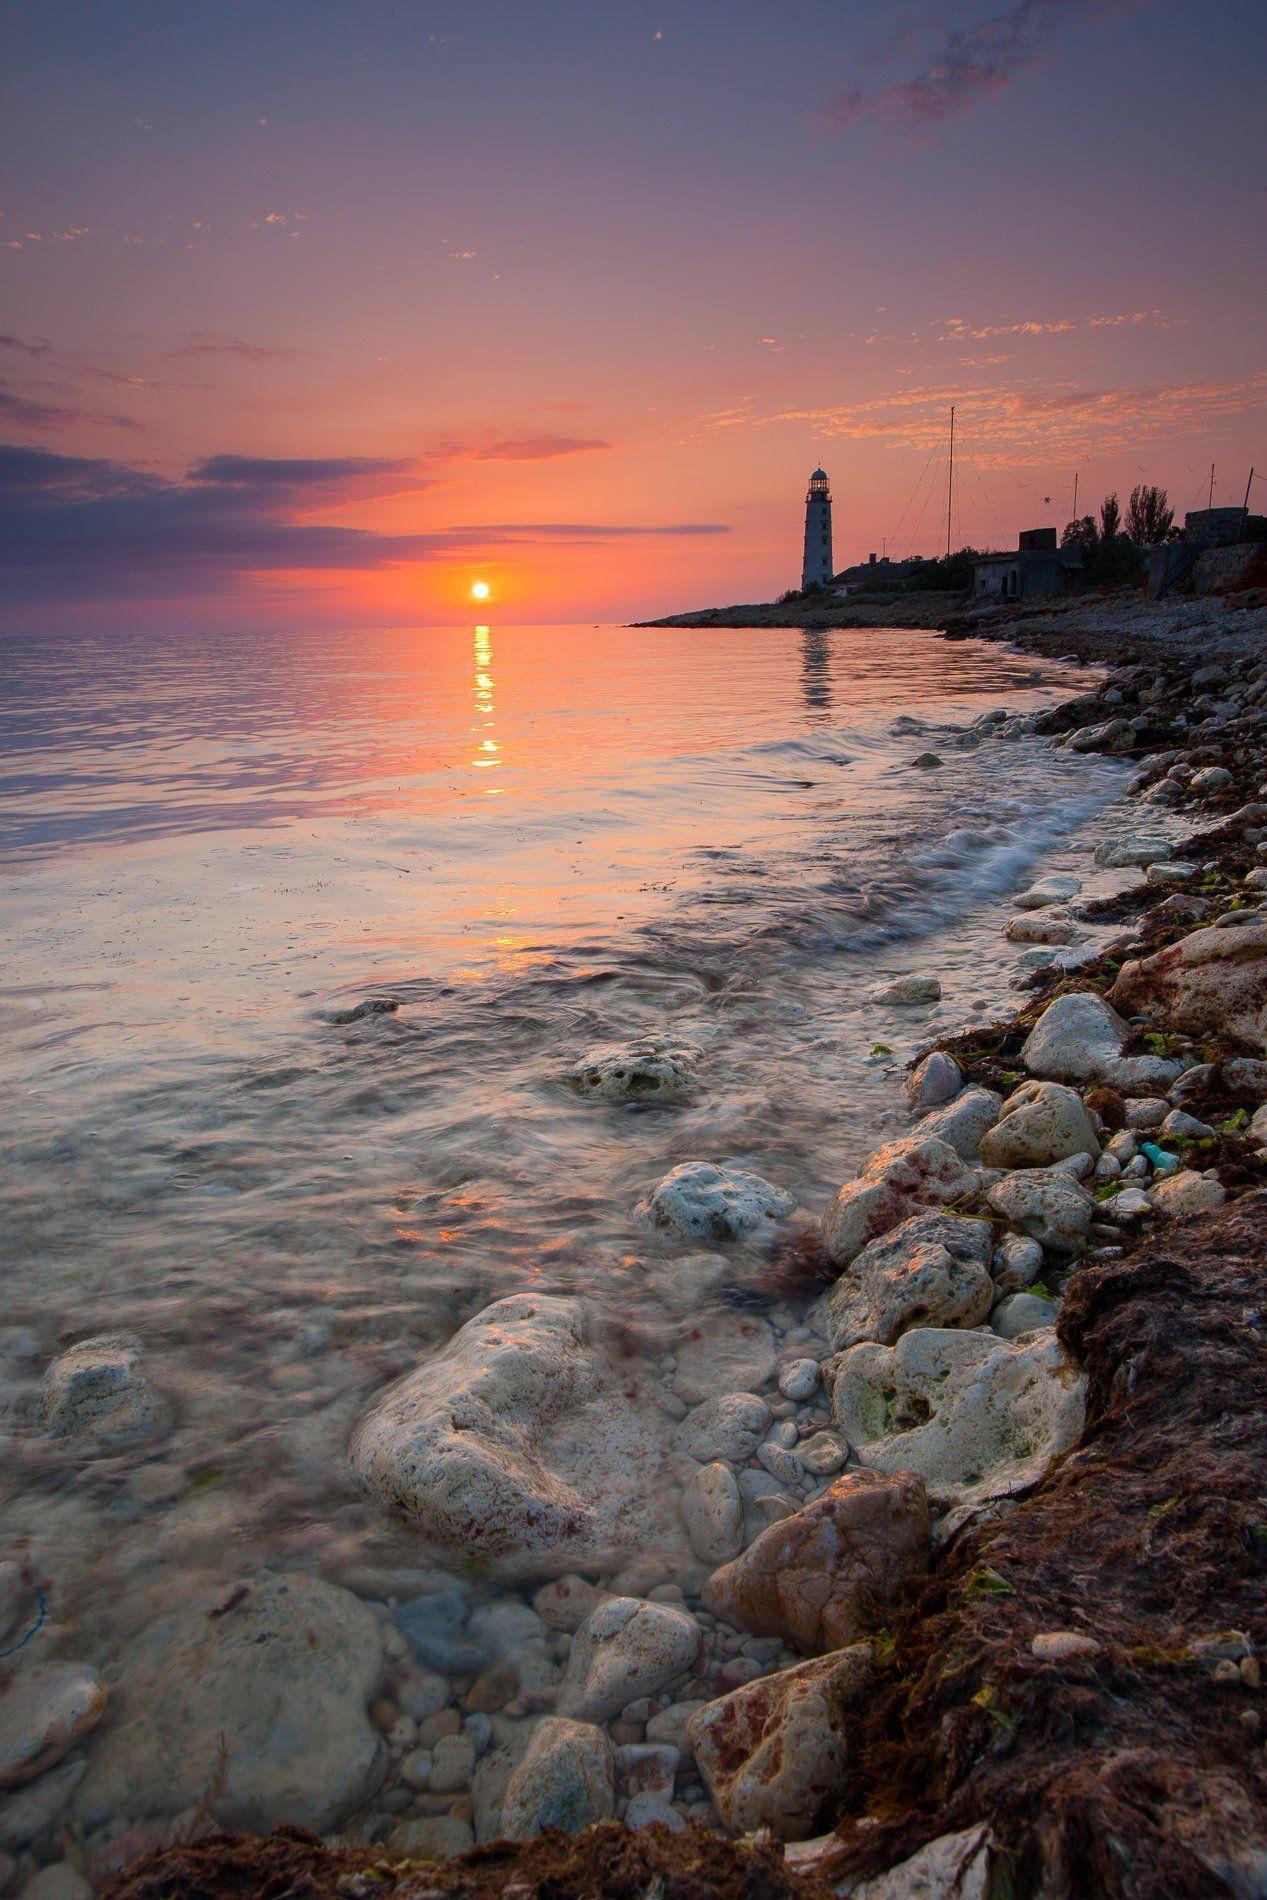 херсонес, мыс херсонес, черное море, крым, херсонесский маяк, севастополь, Titov Serge